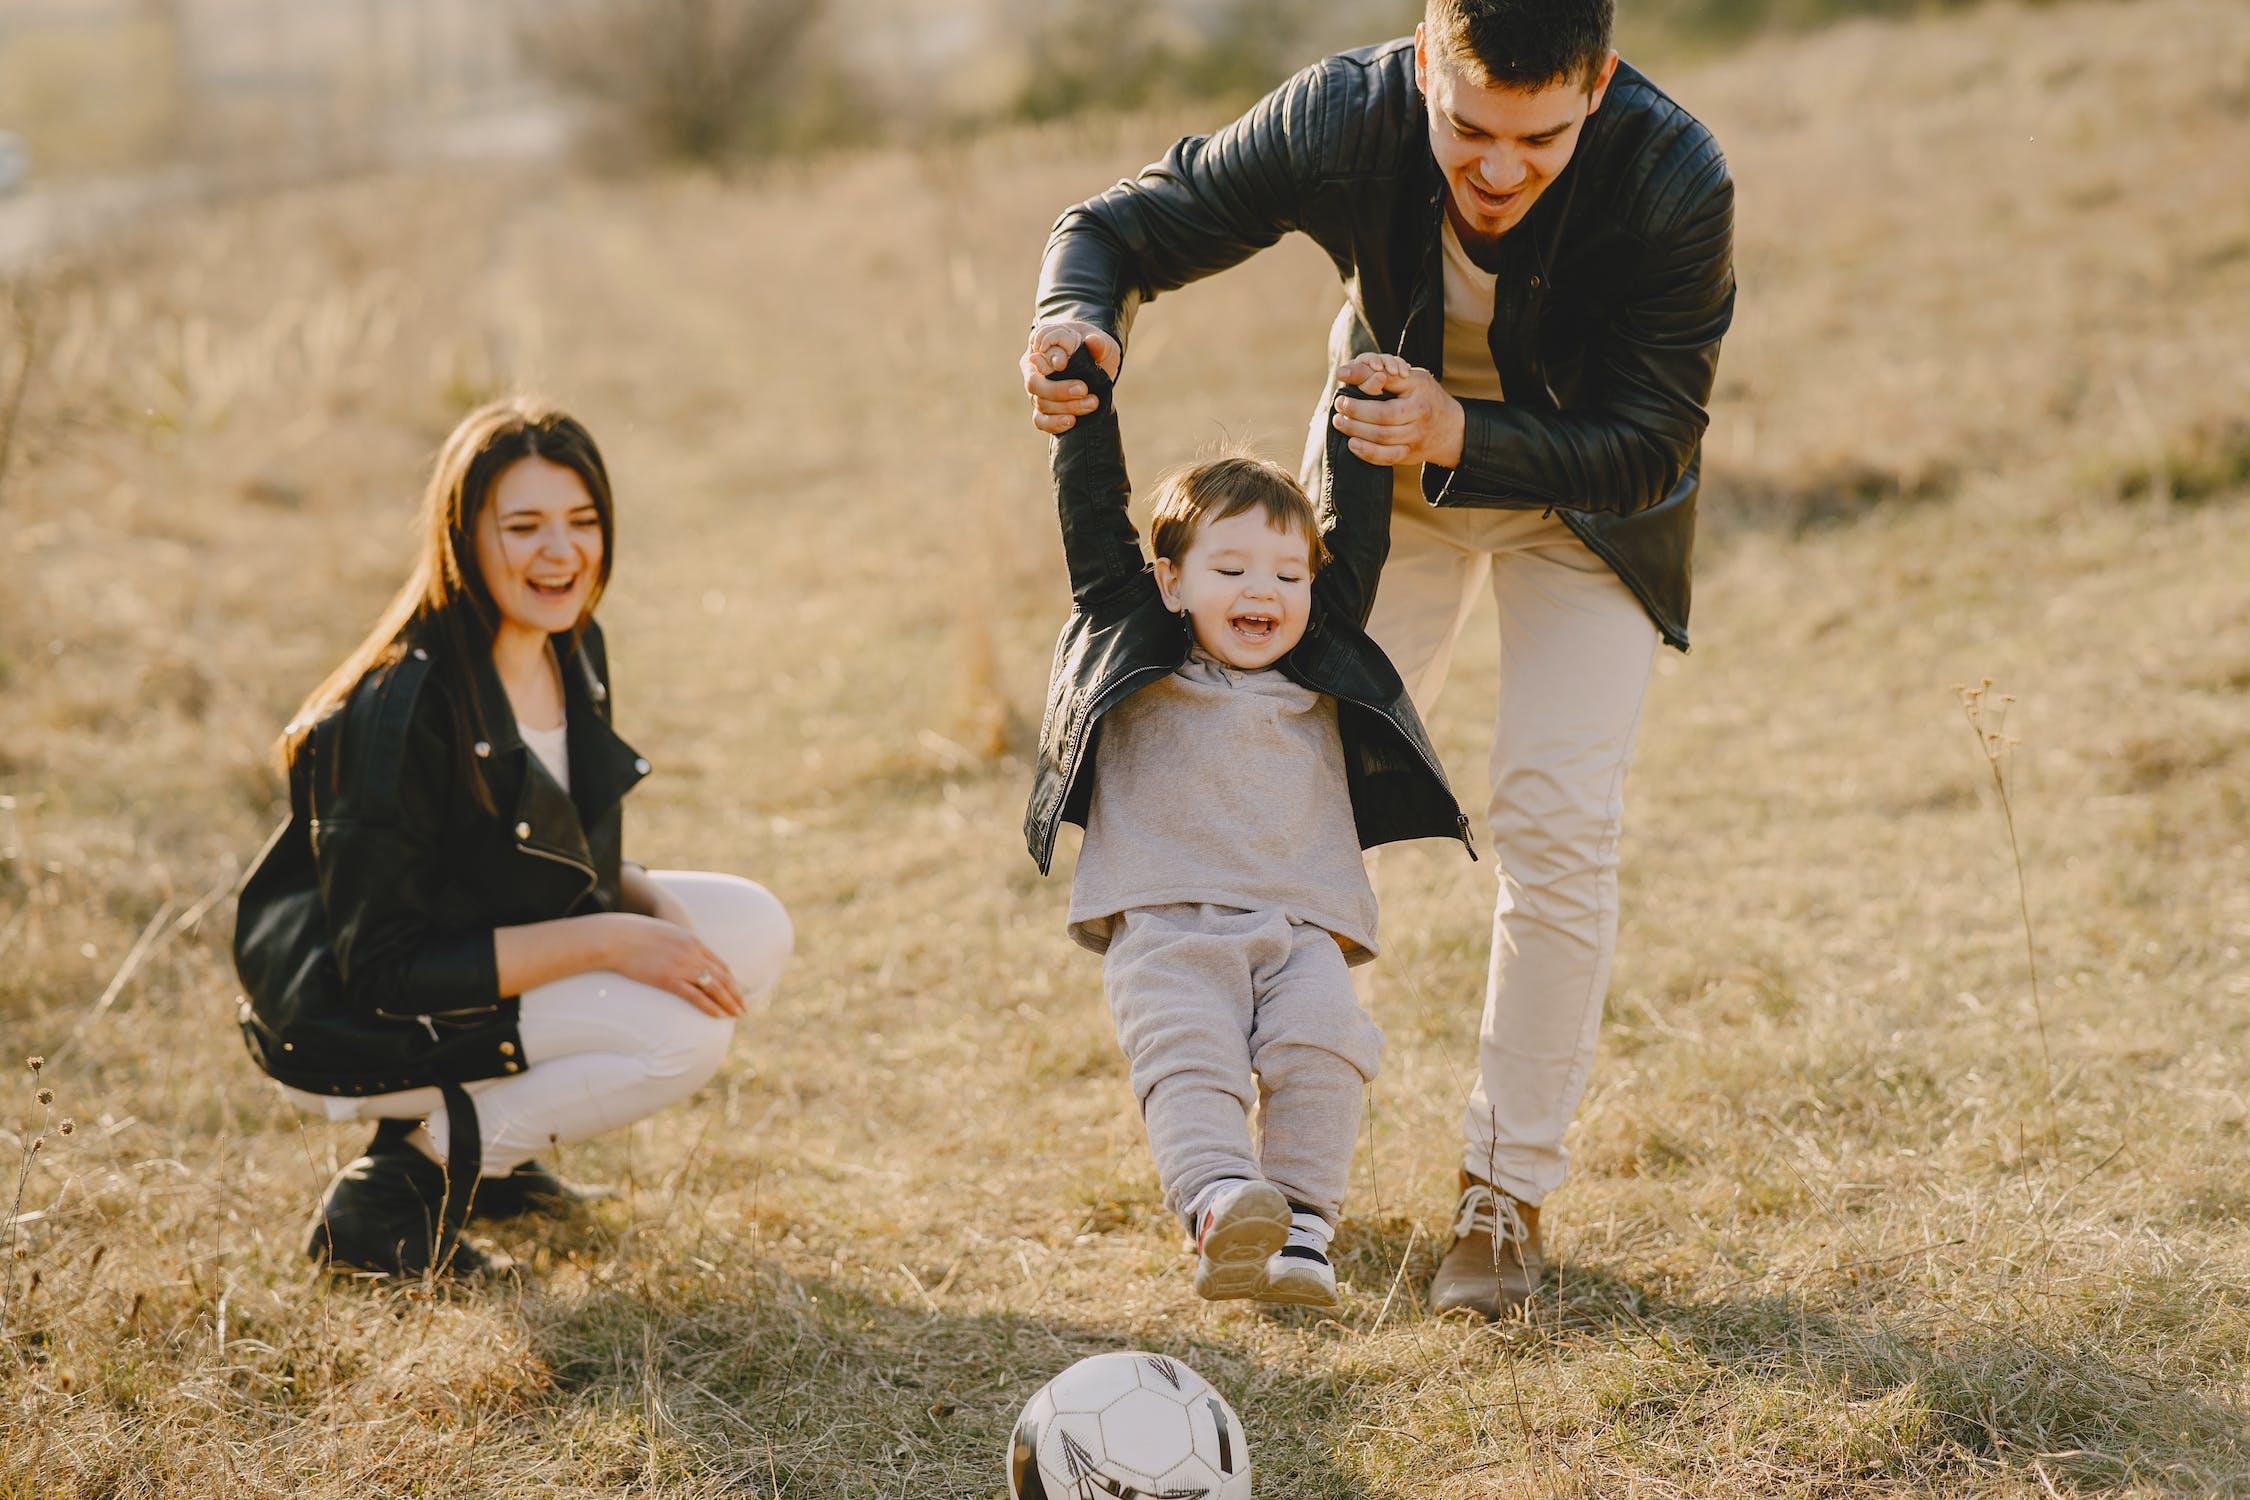 עורך דין דיני משפחה בעפולה